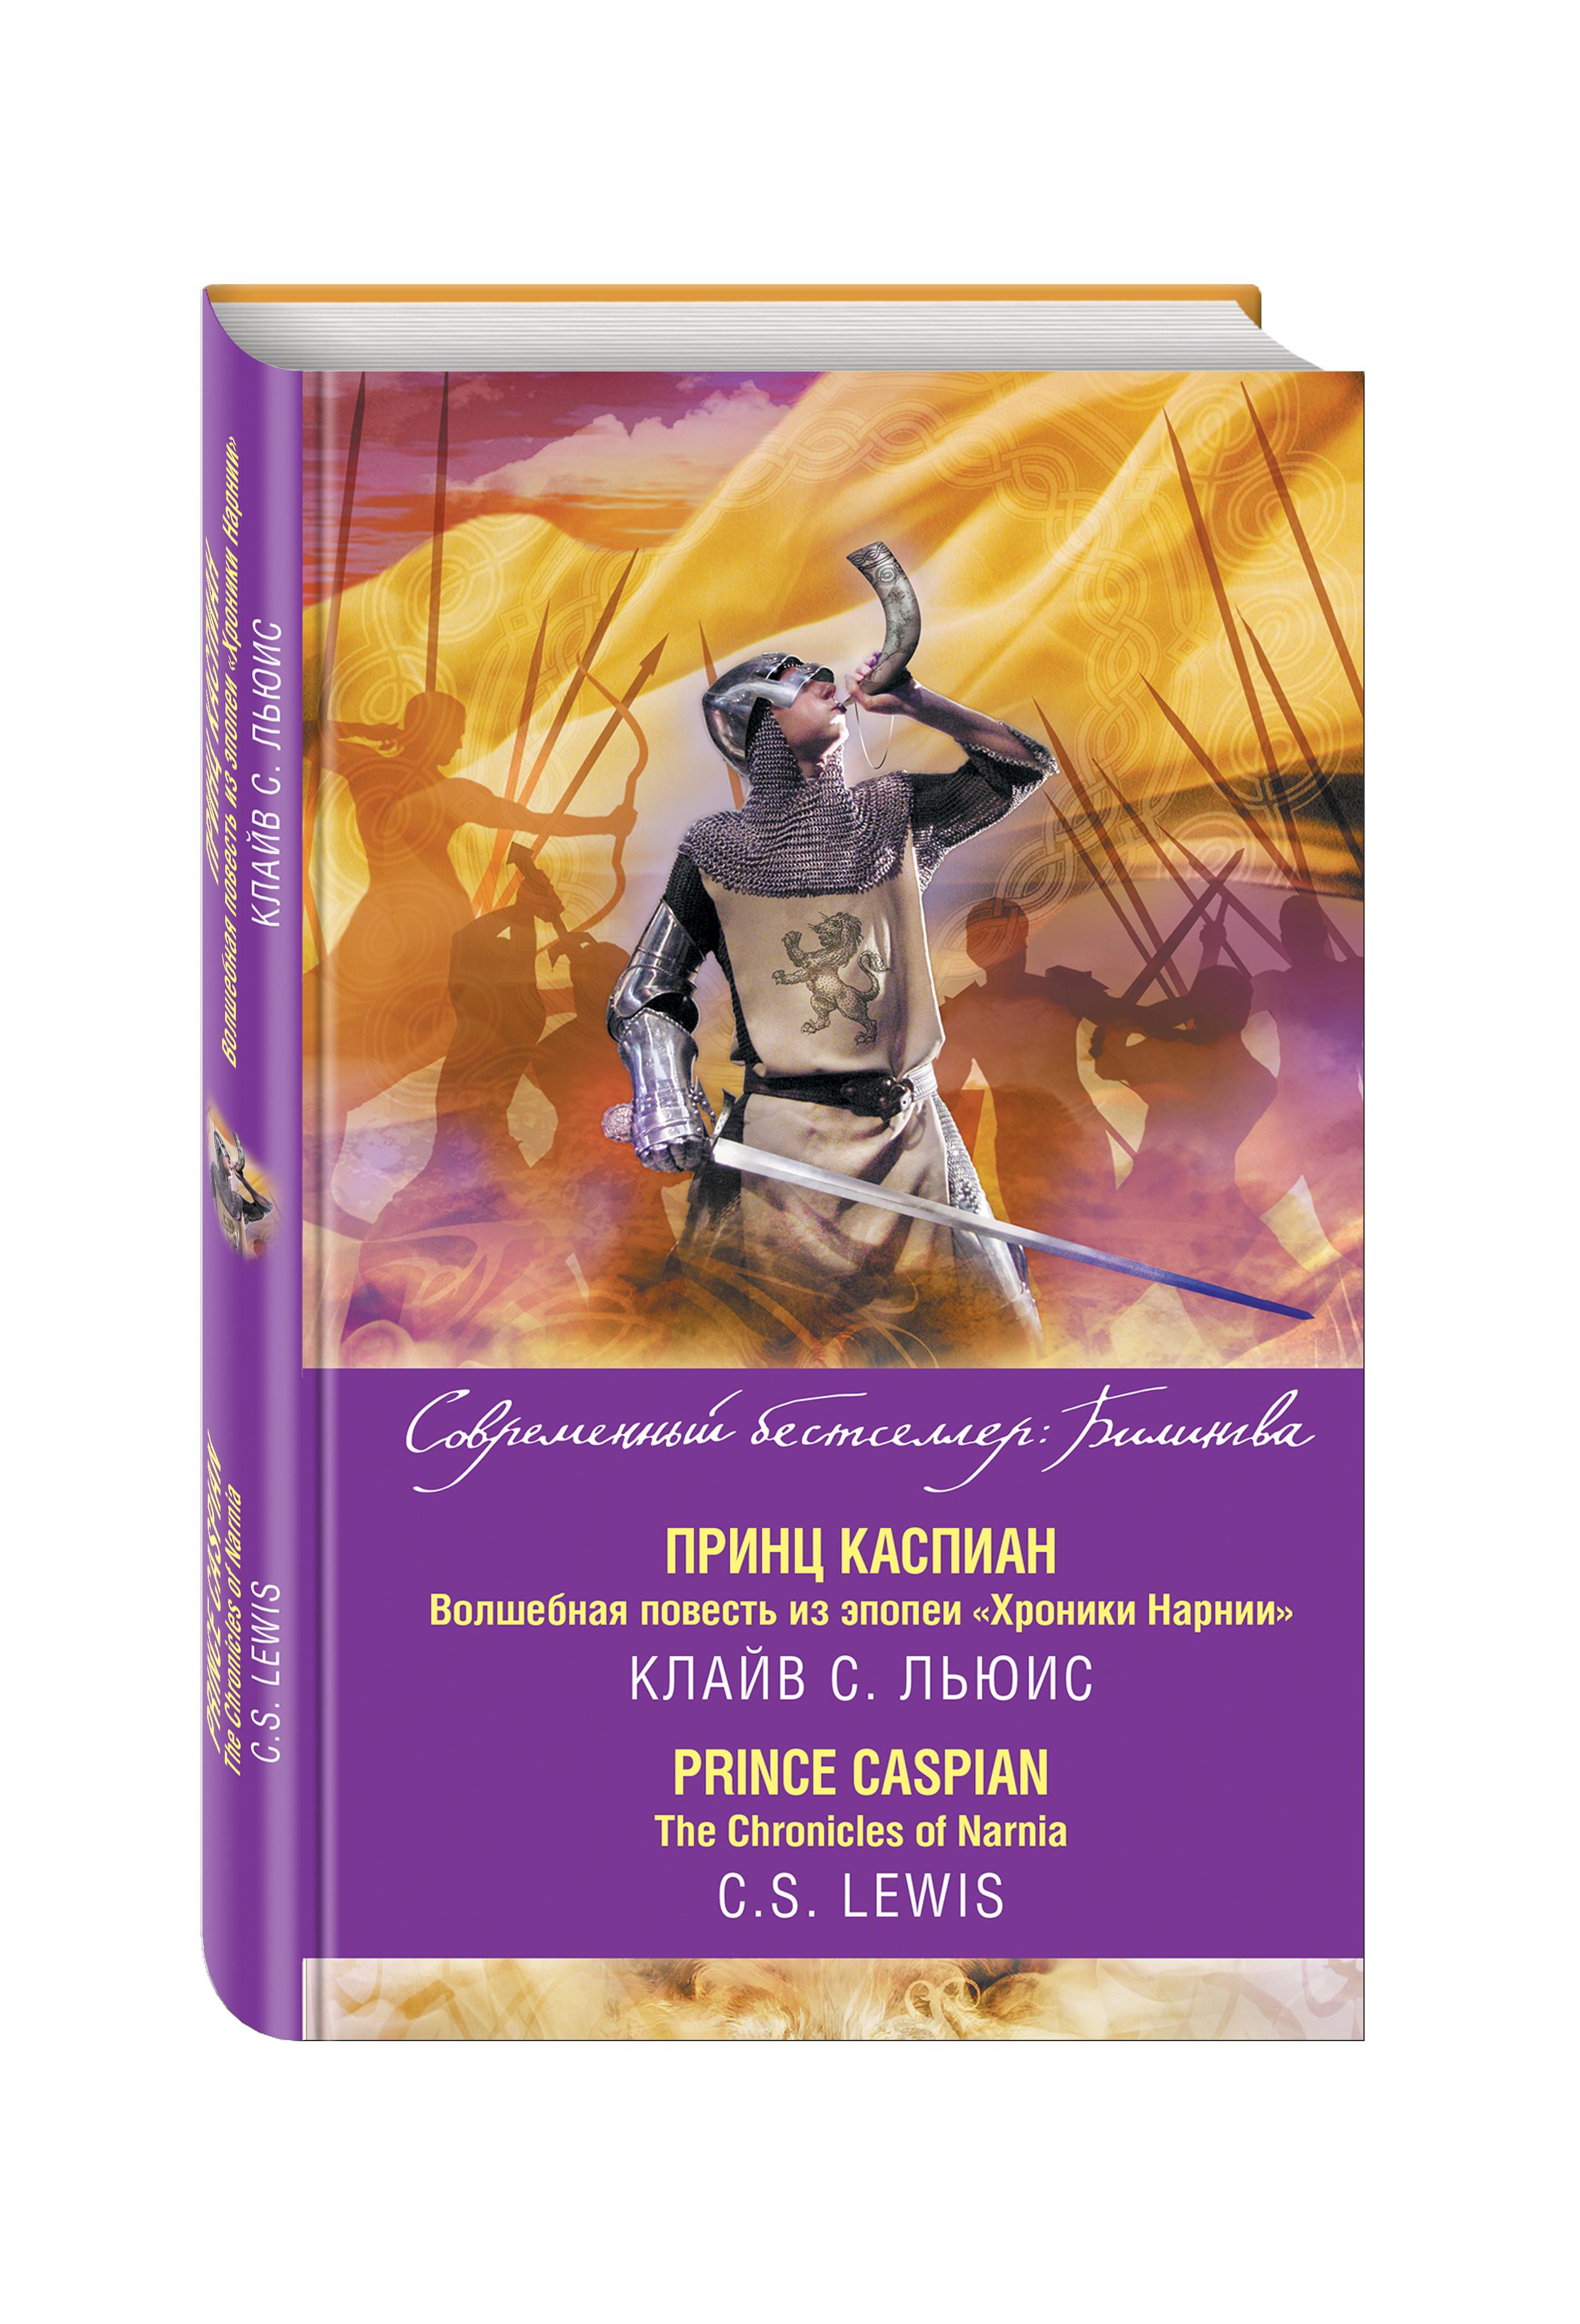 Льюис К. Принц Каспиан. Волшебная повесть из эпопеи «Хроники Нарнии» = The Chronicles of Narnia. Prince Caspian lewis c prince caspian the chronicles of narnia book 4